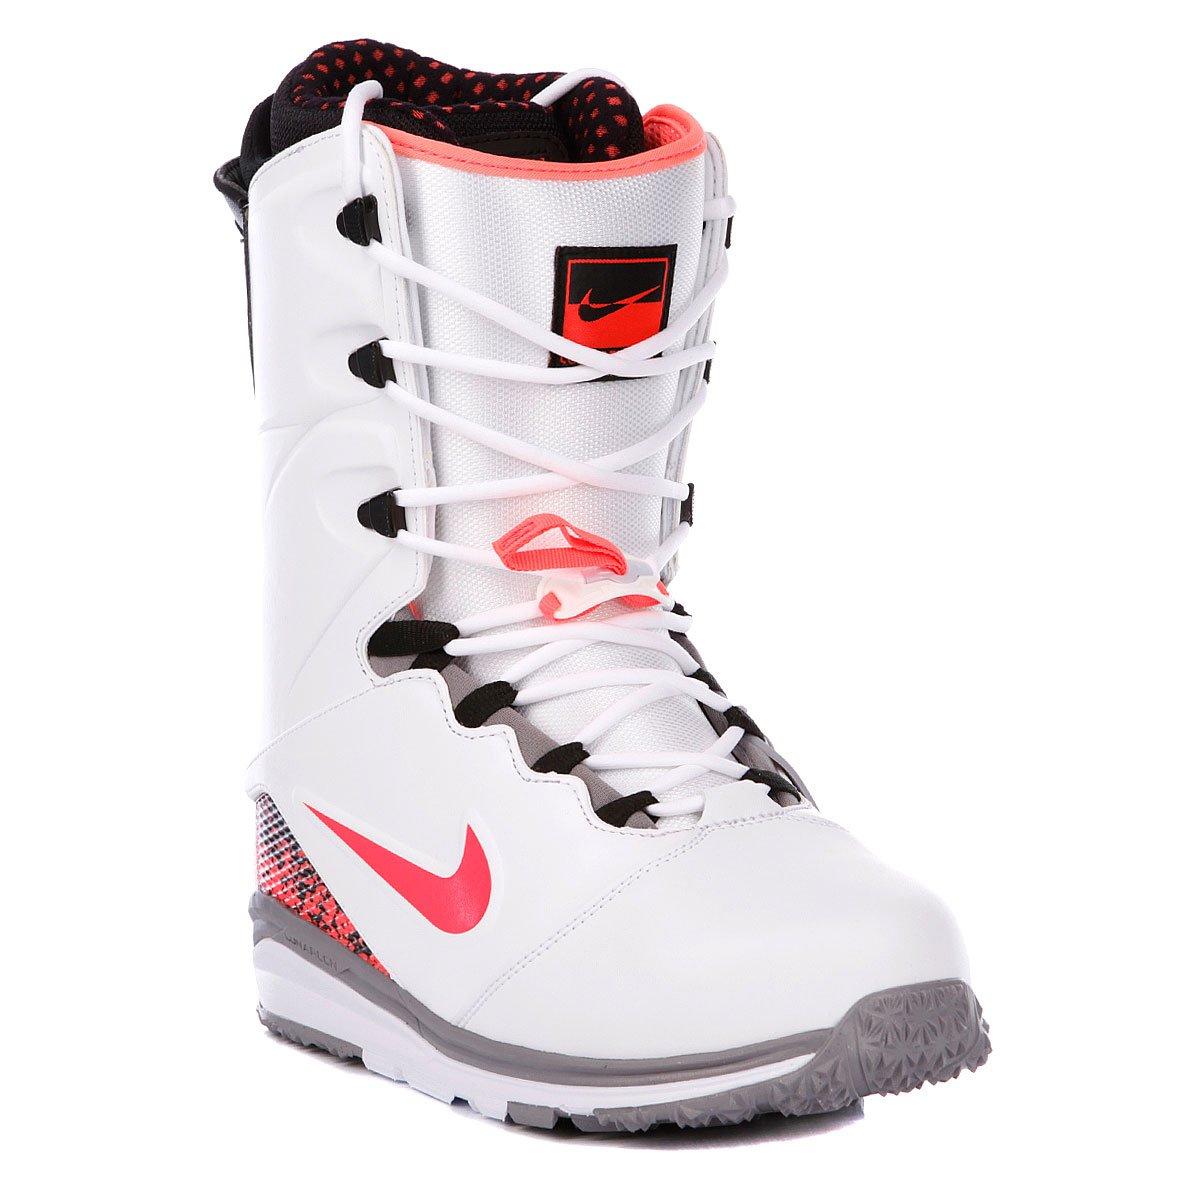 6d4bb715 Купить ботинки для сноуборда Nike Lunarendor White/Hot Lava (586532 ...